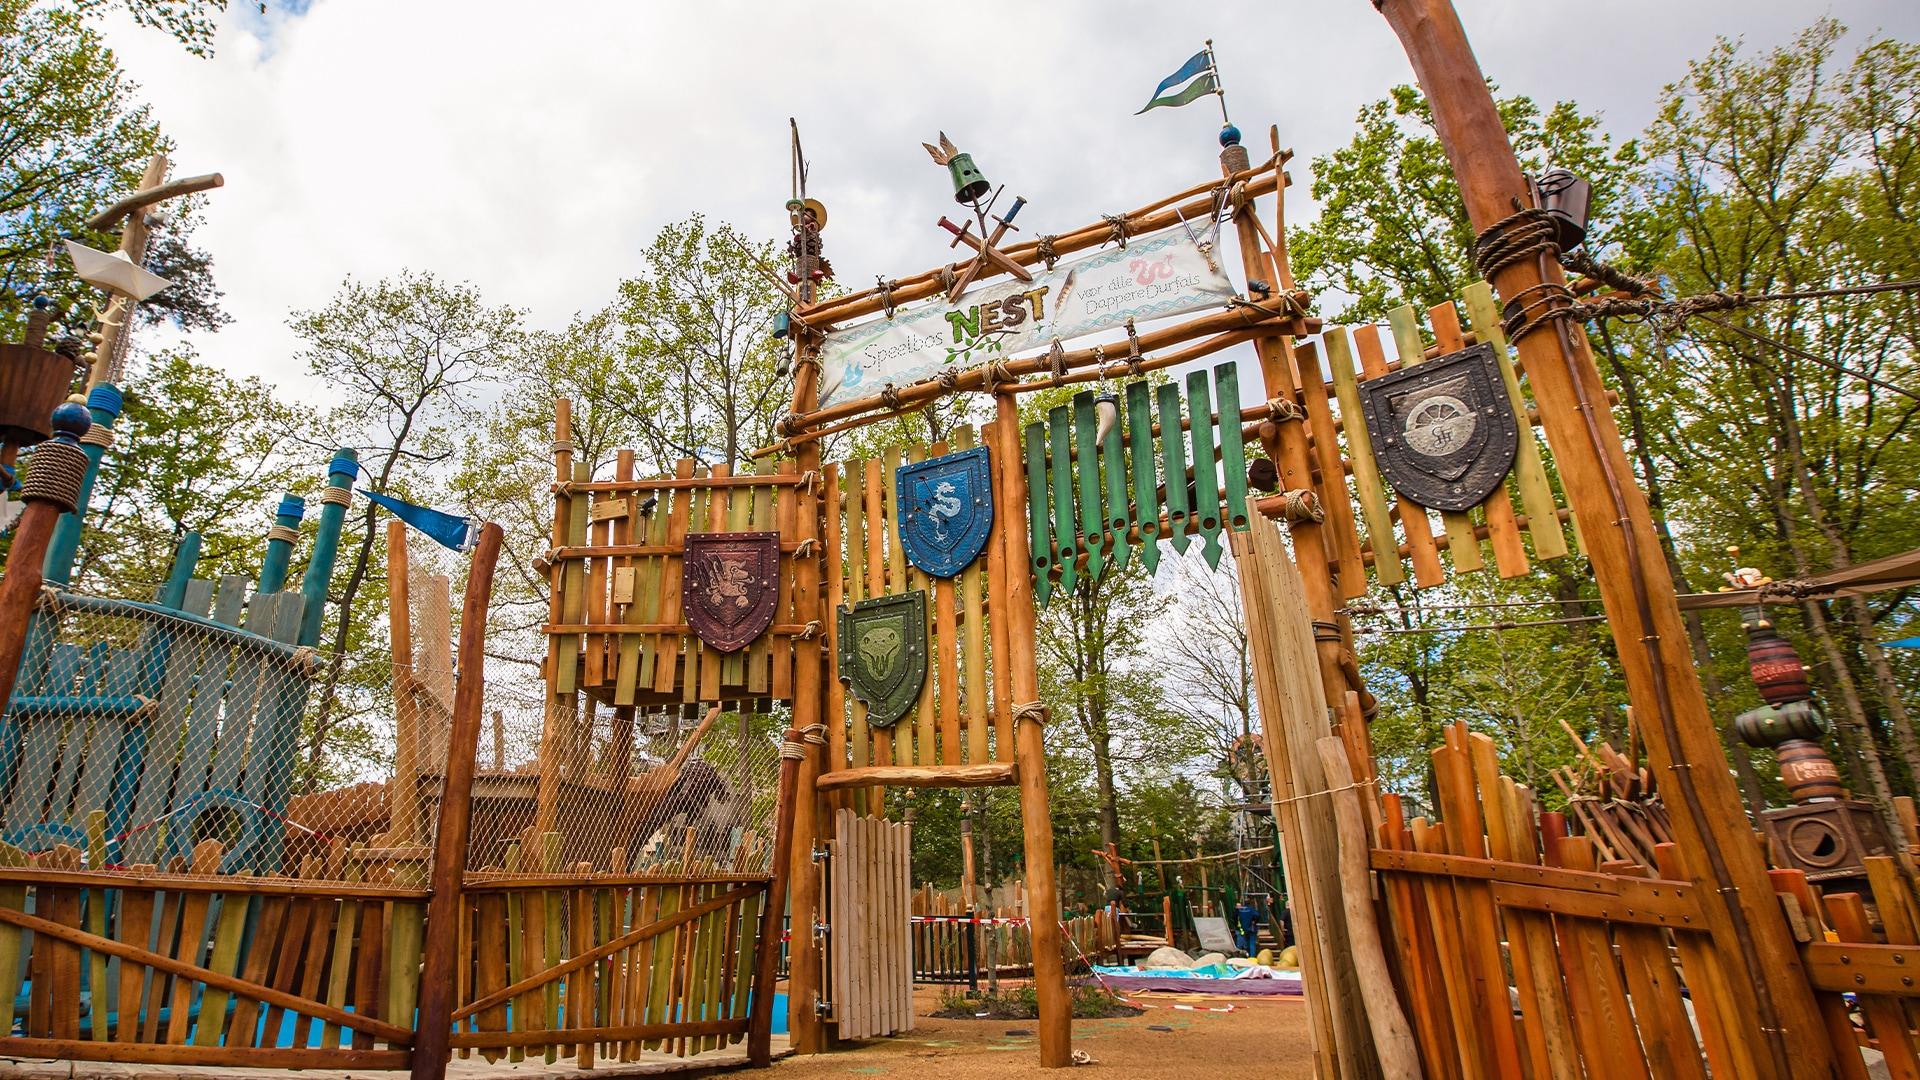 Efteling theme park - Nest!